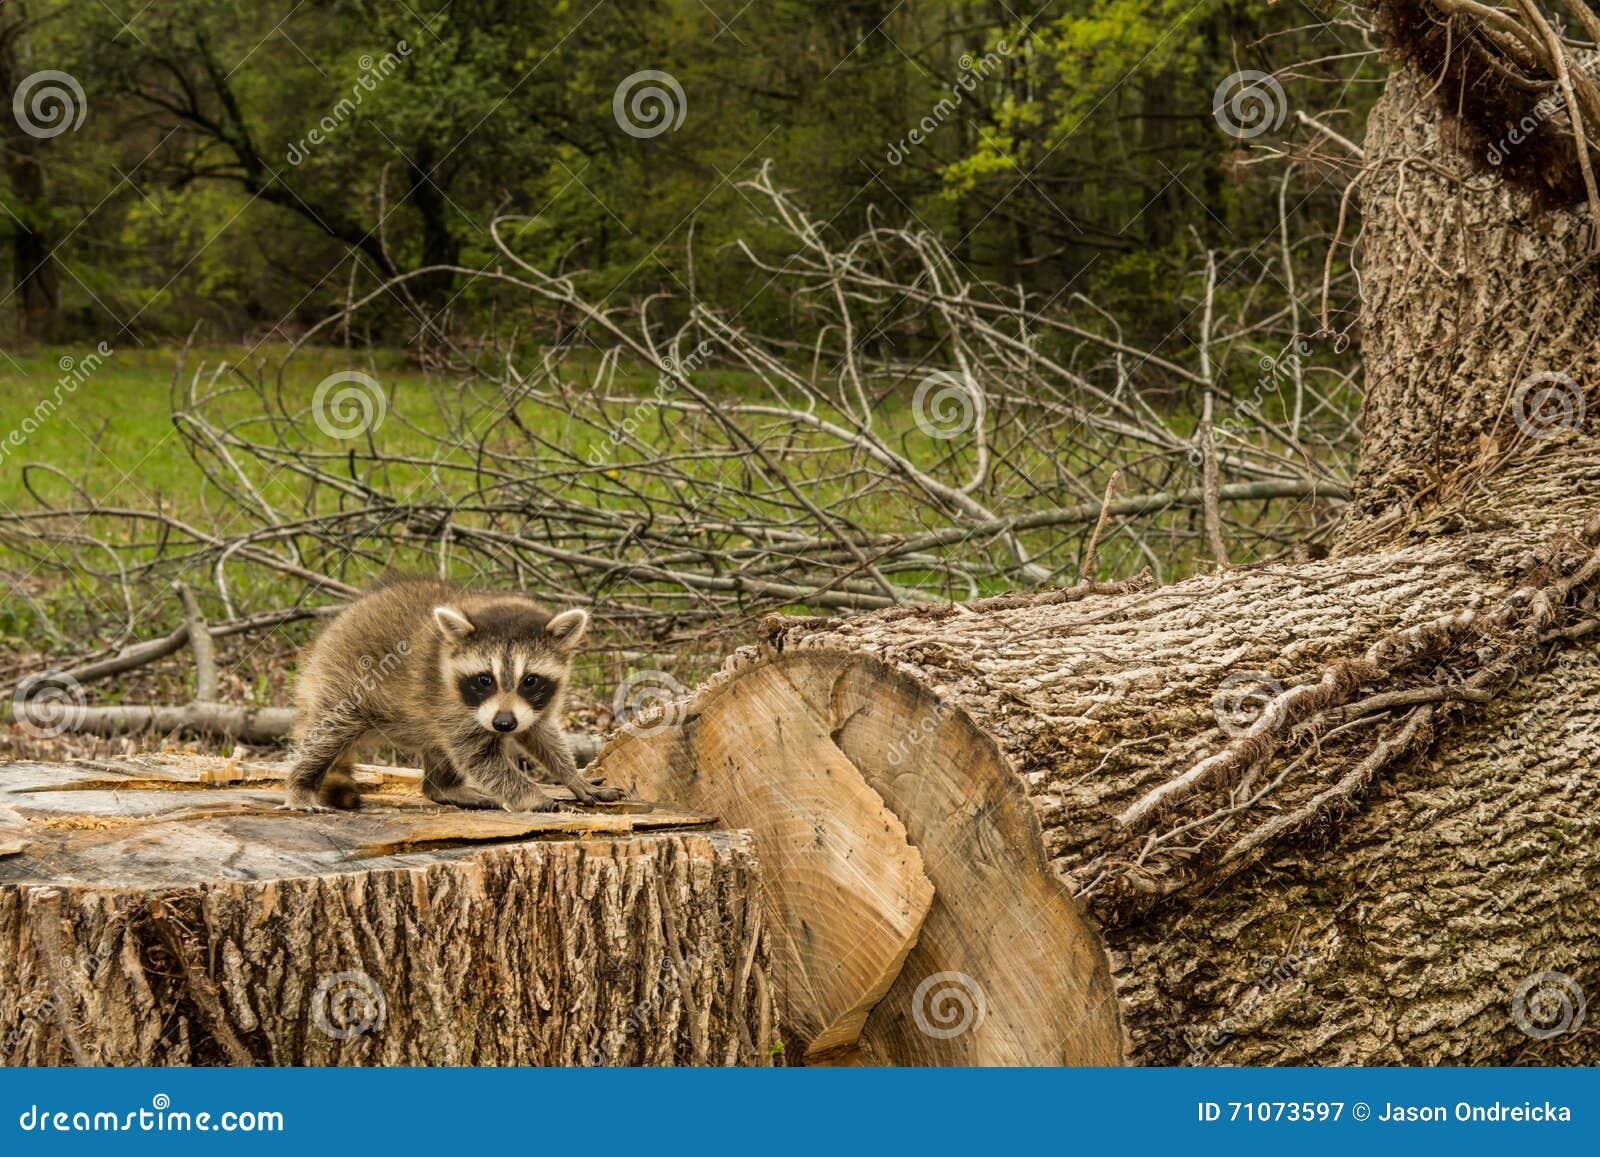 Negative Effects Of Deforestation Stock Photo - Image: 71073597